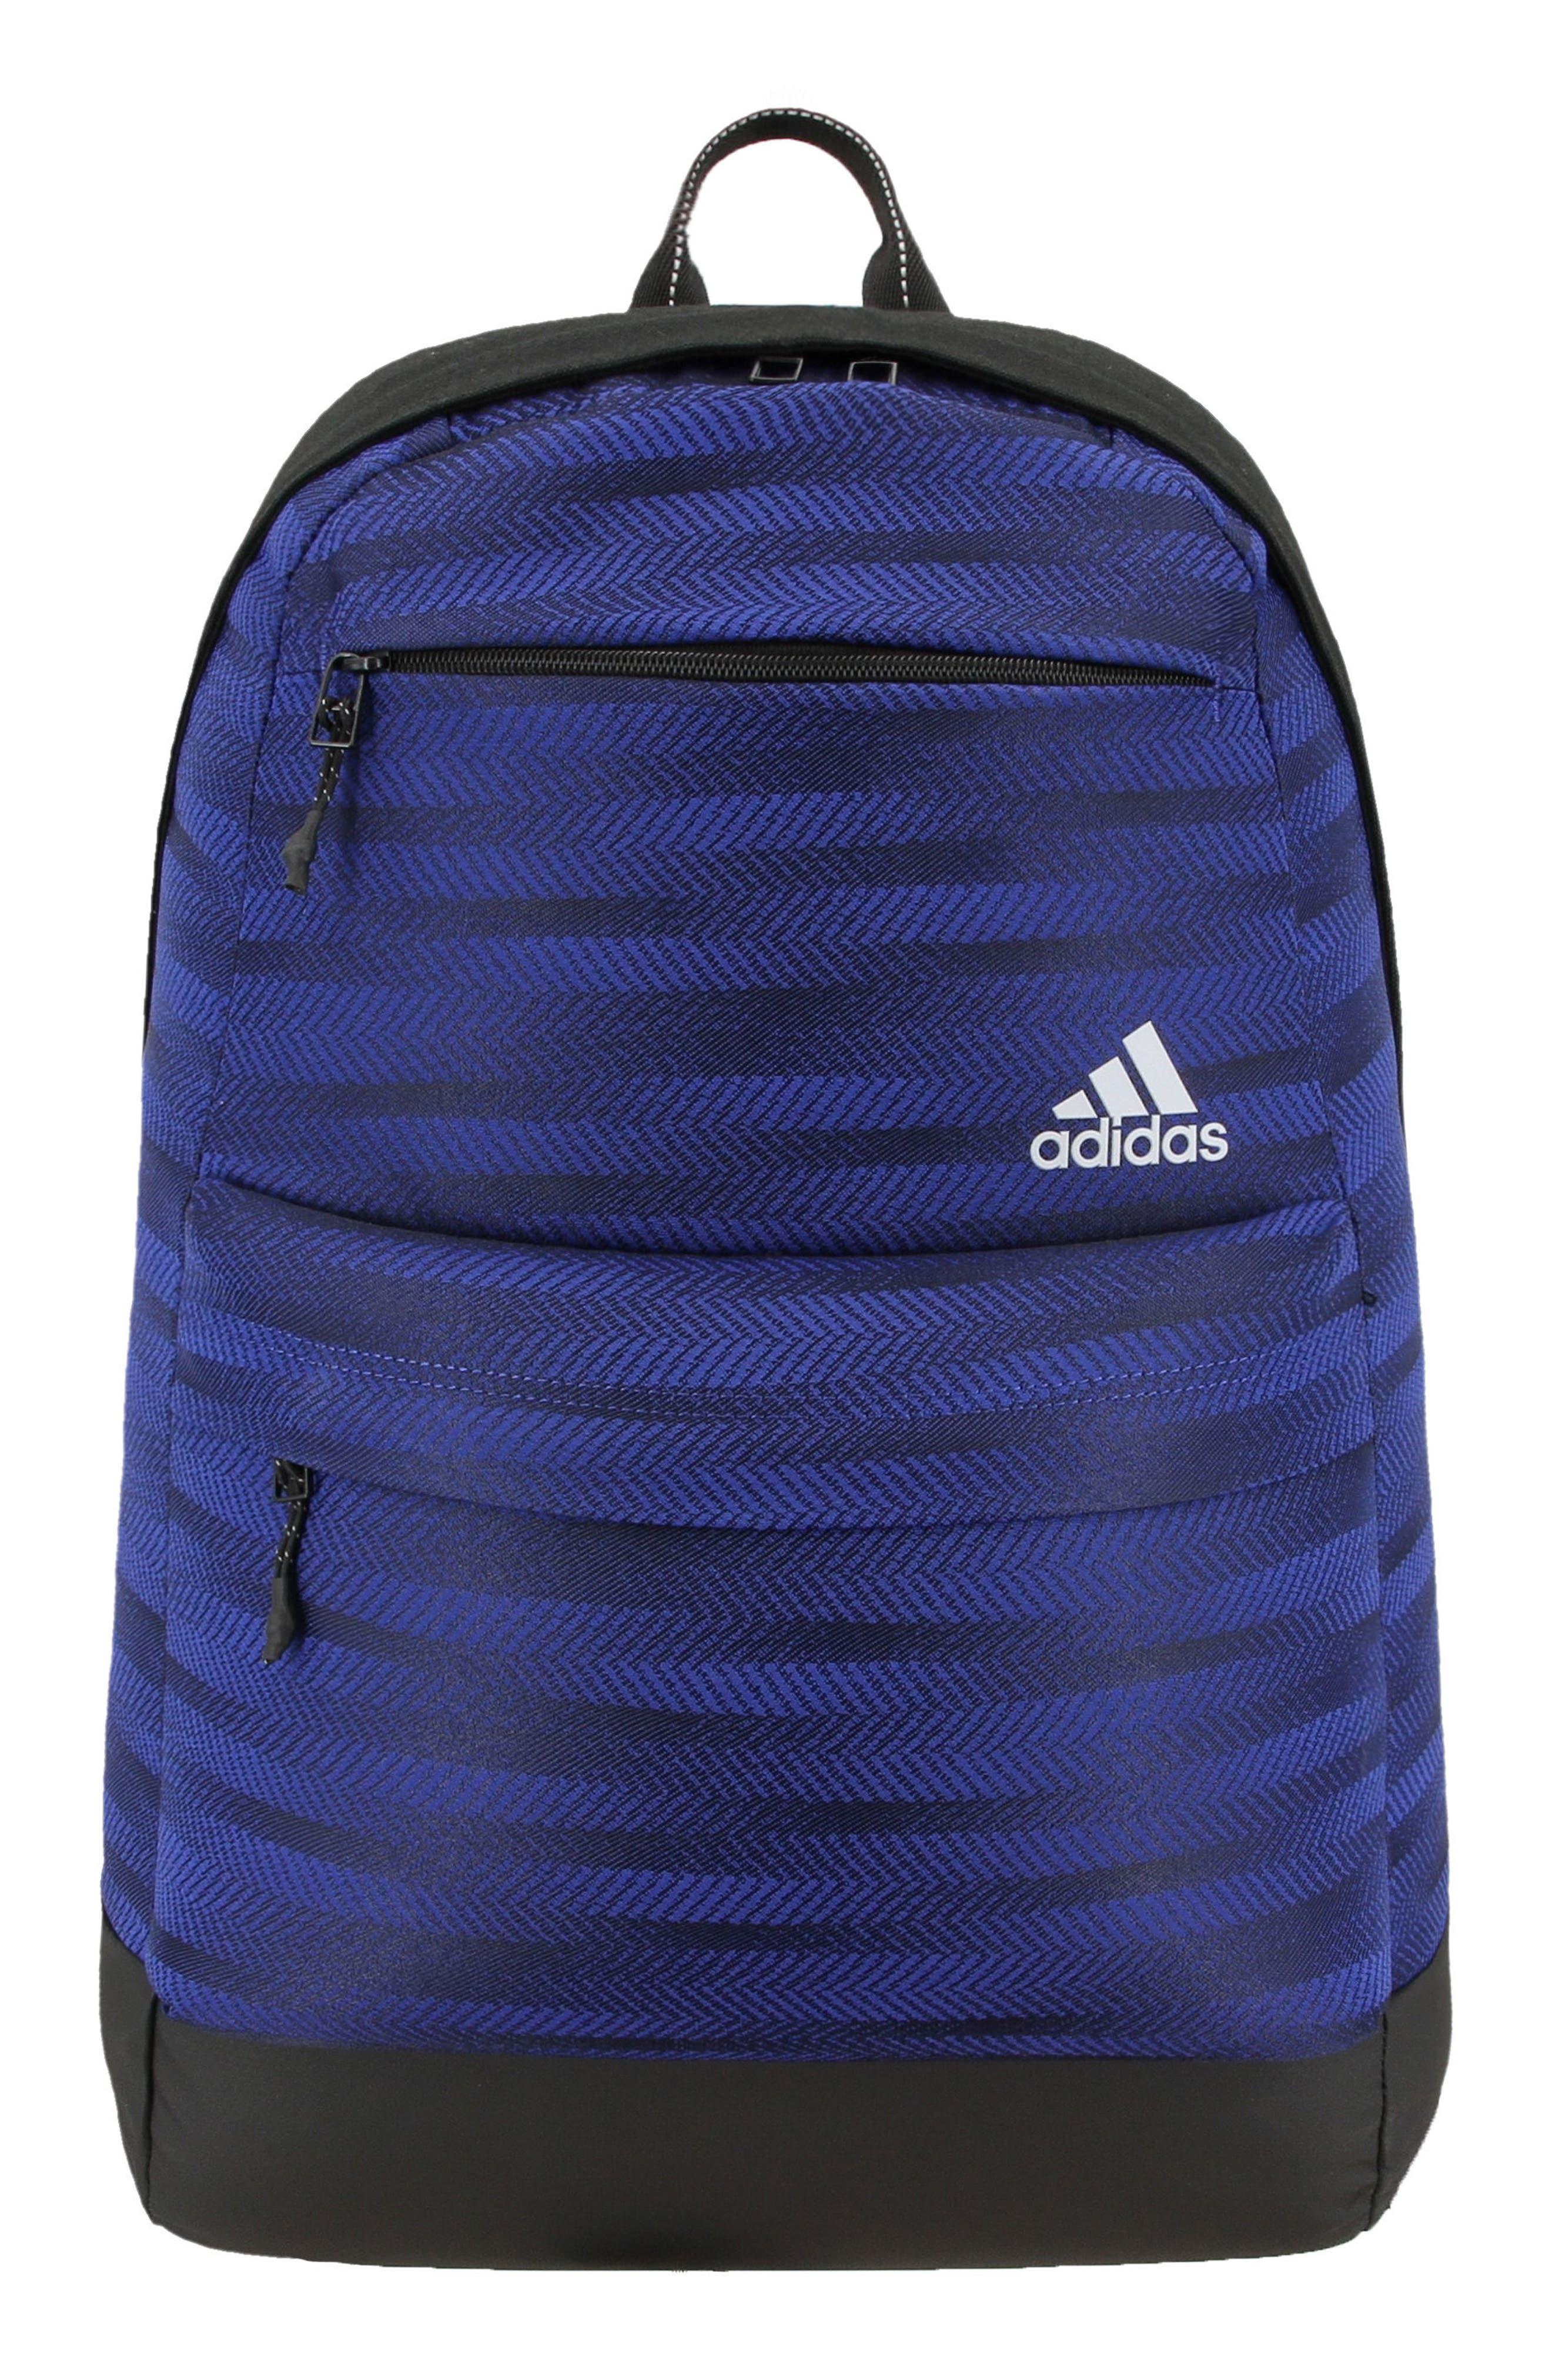 Daybreak Backpack,                         Main,                         color, 400